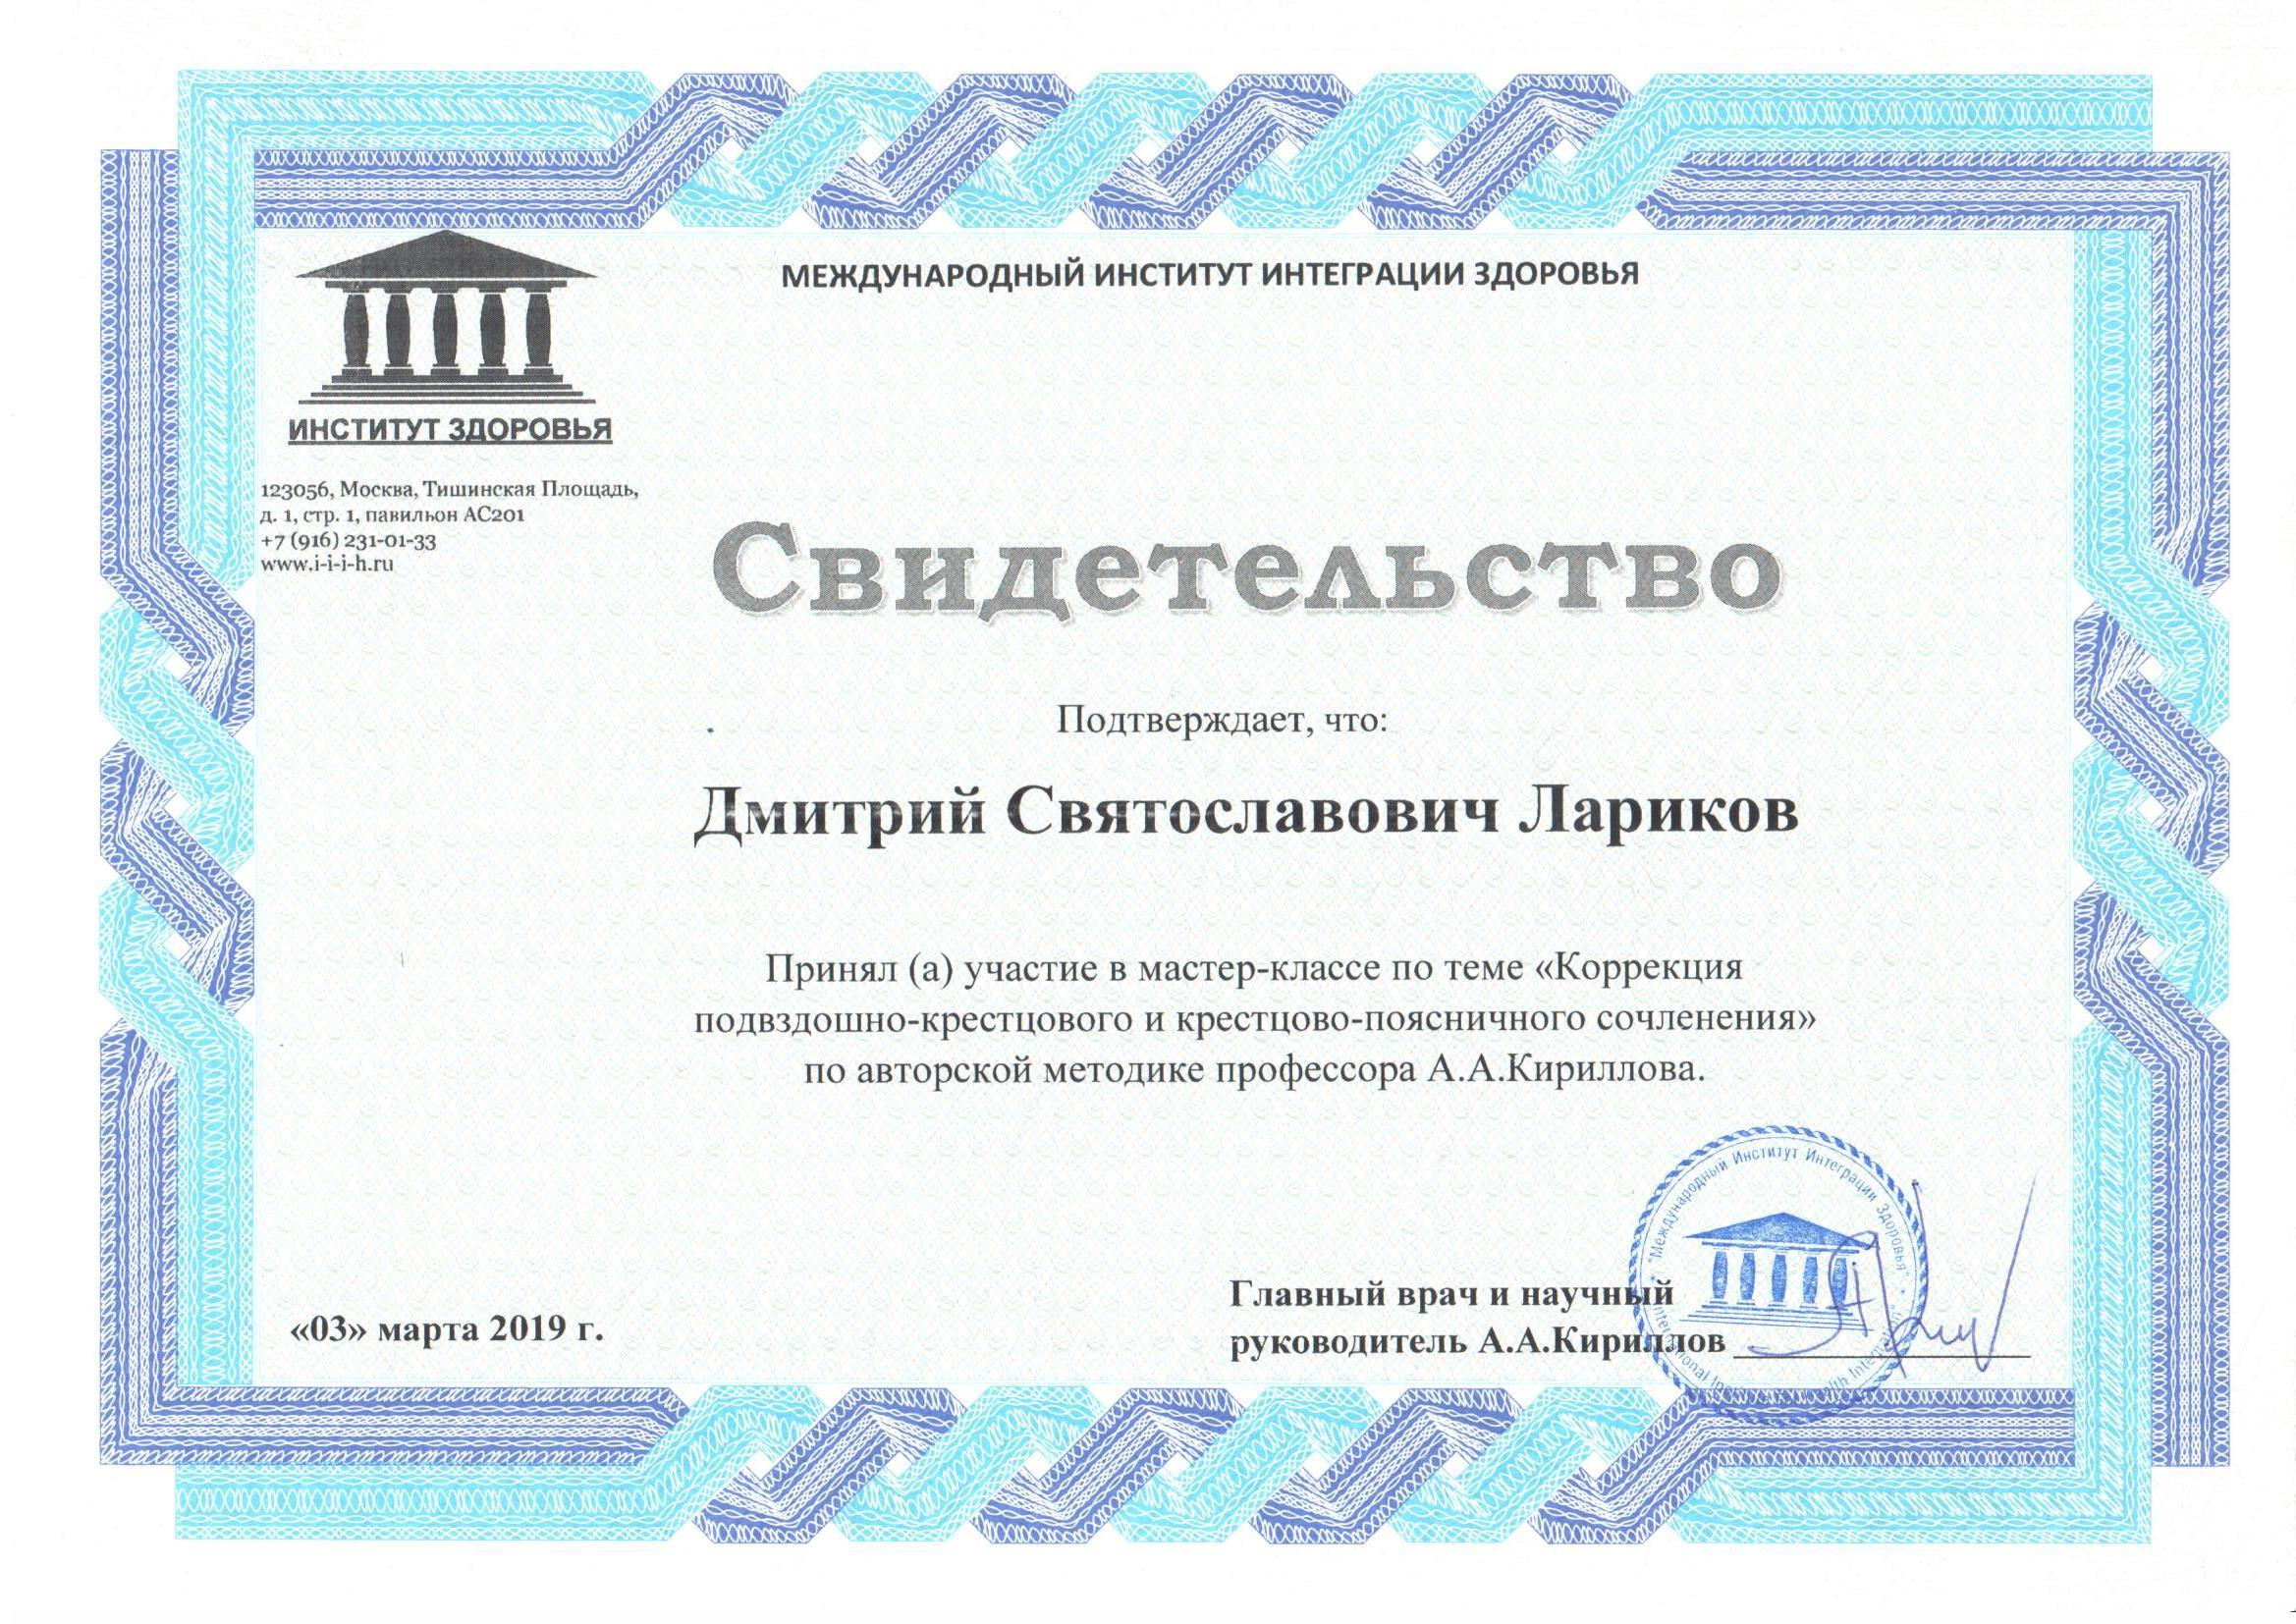 Кириллов Подвздошно-крестцовый 03-2019